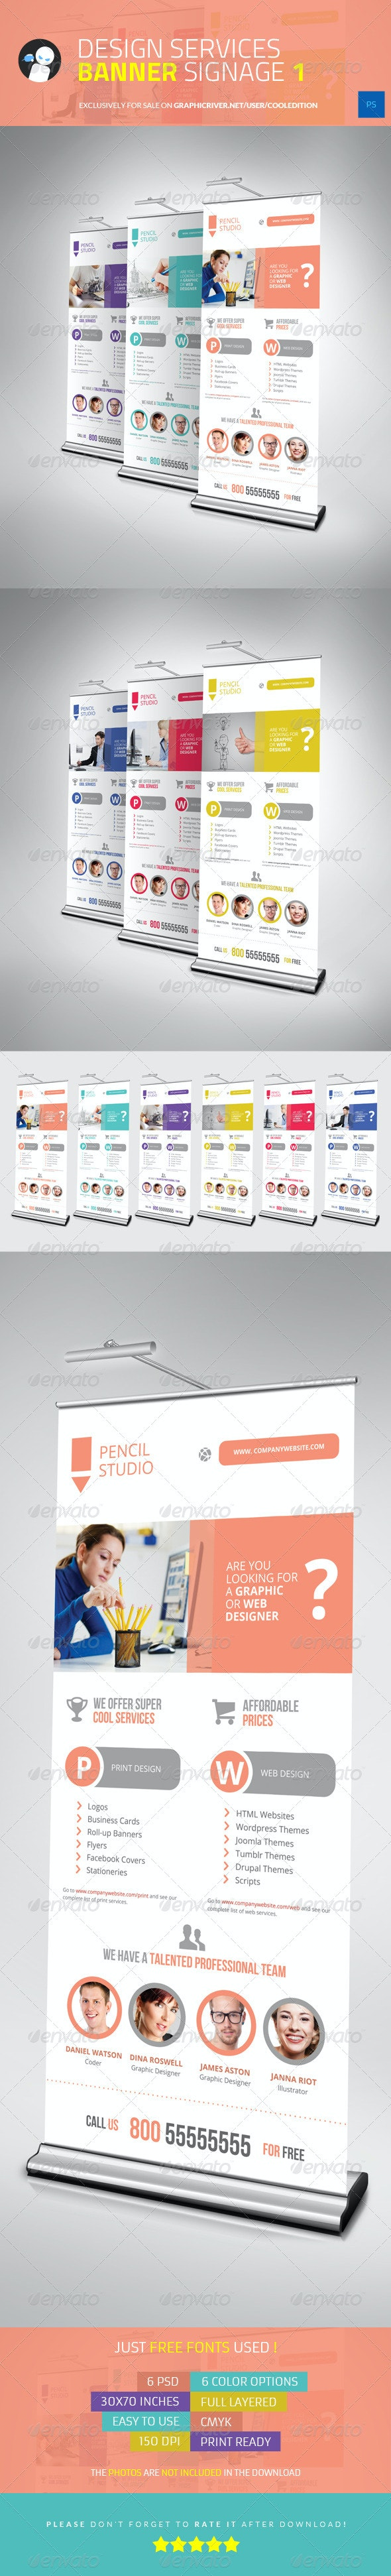 Design Services Banner Signage 1 - Signage Print Templates